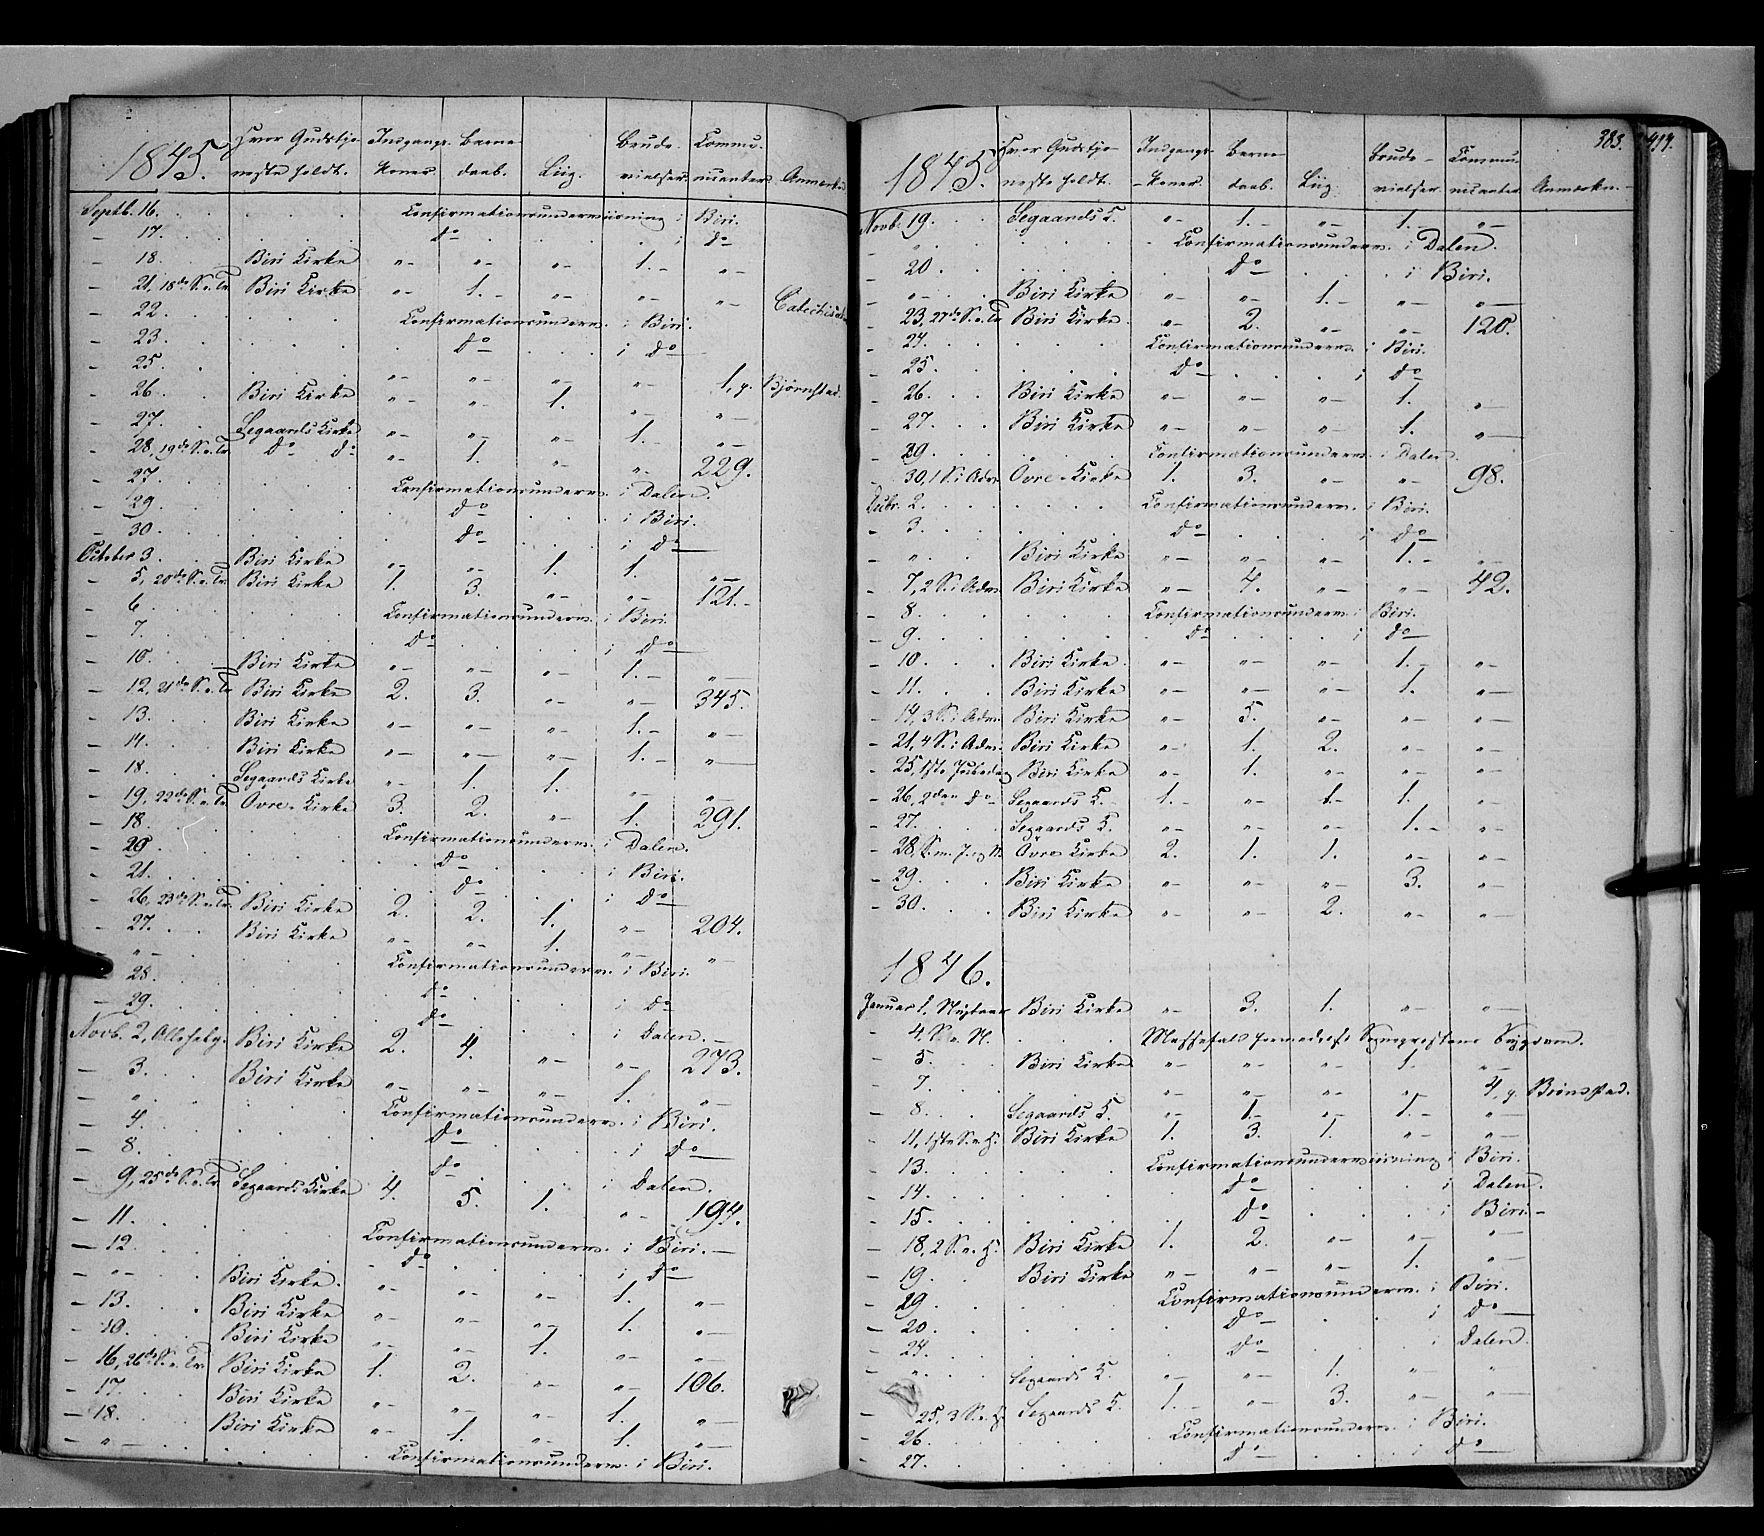 SAH, Biri prestekontor, Ministerialbok nr. 5, 1843-1854, s. 383